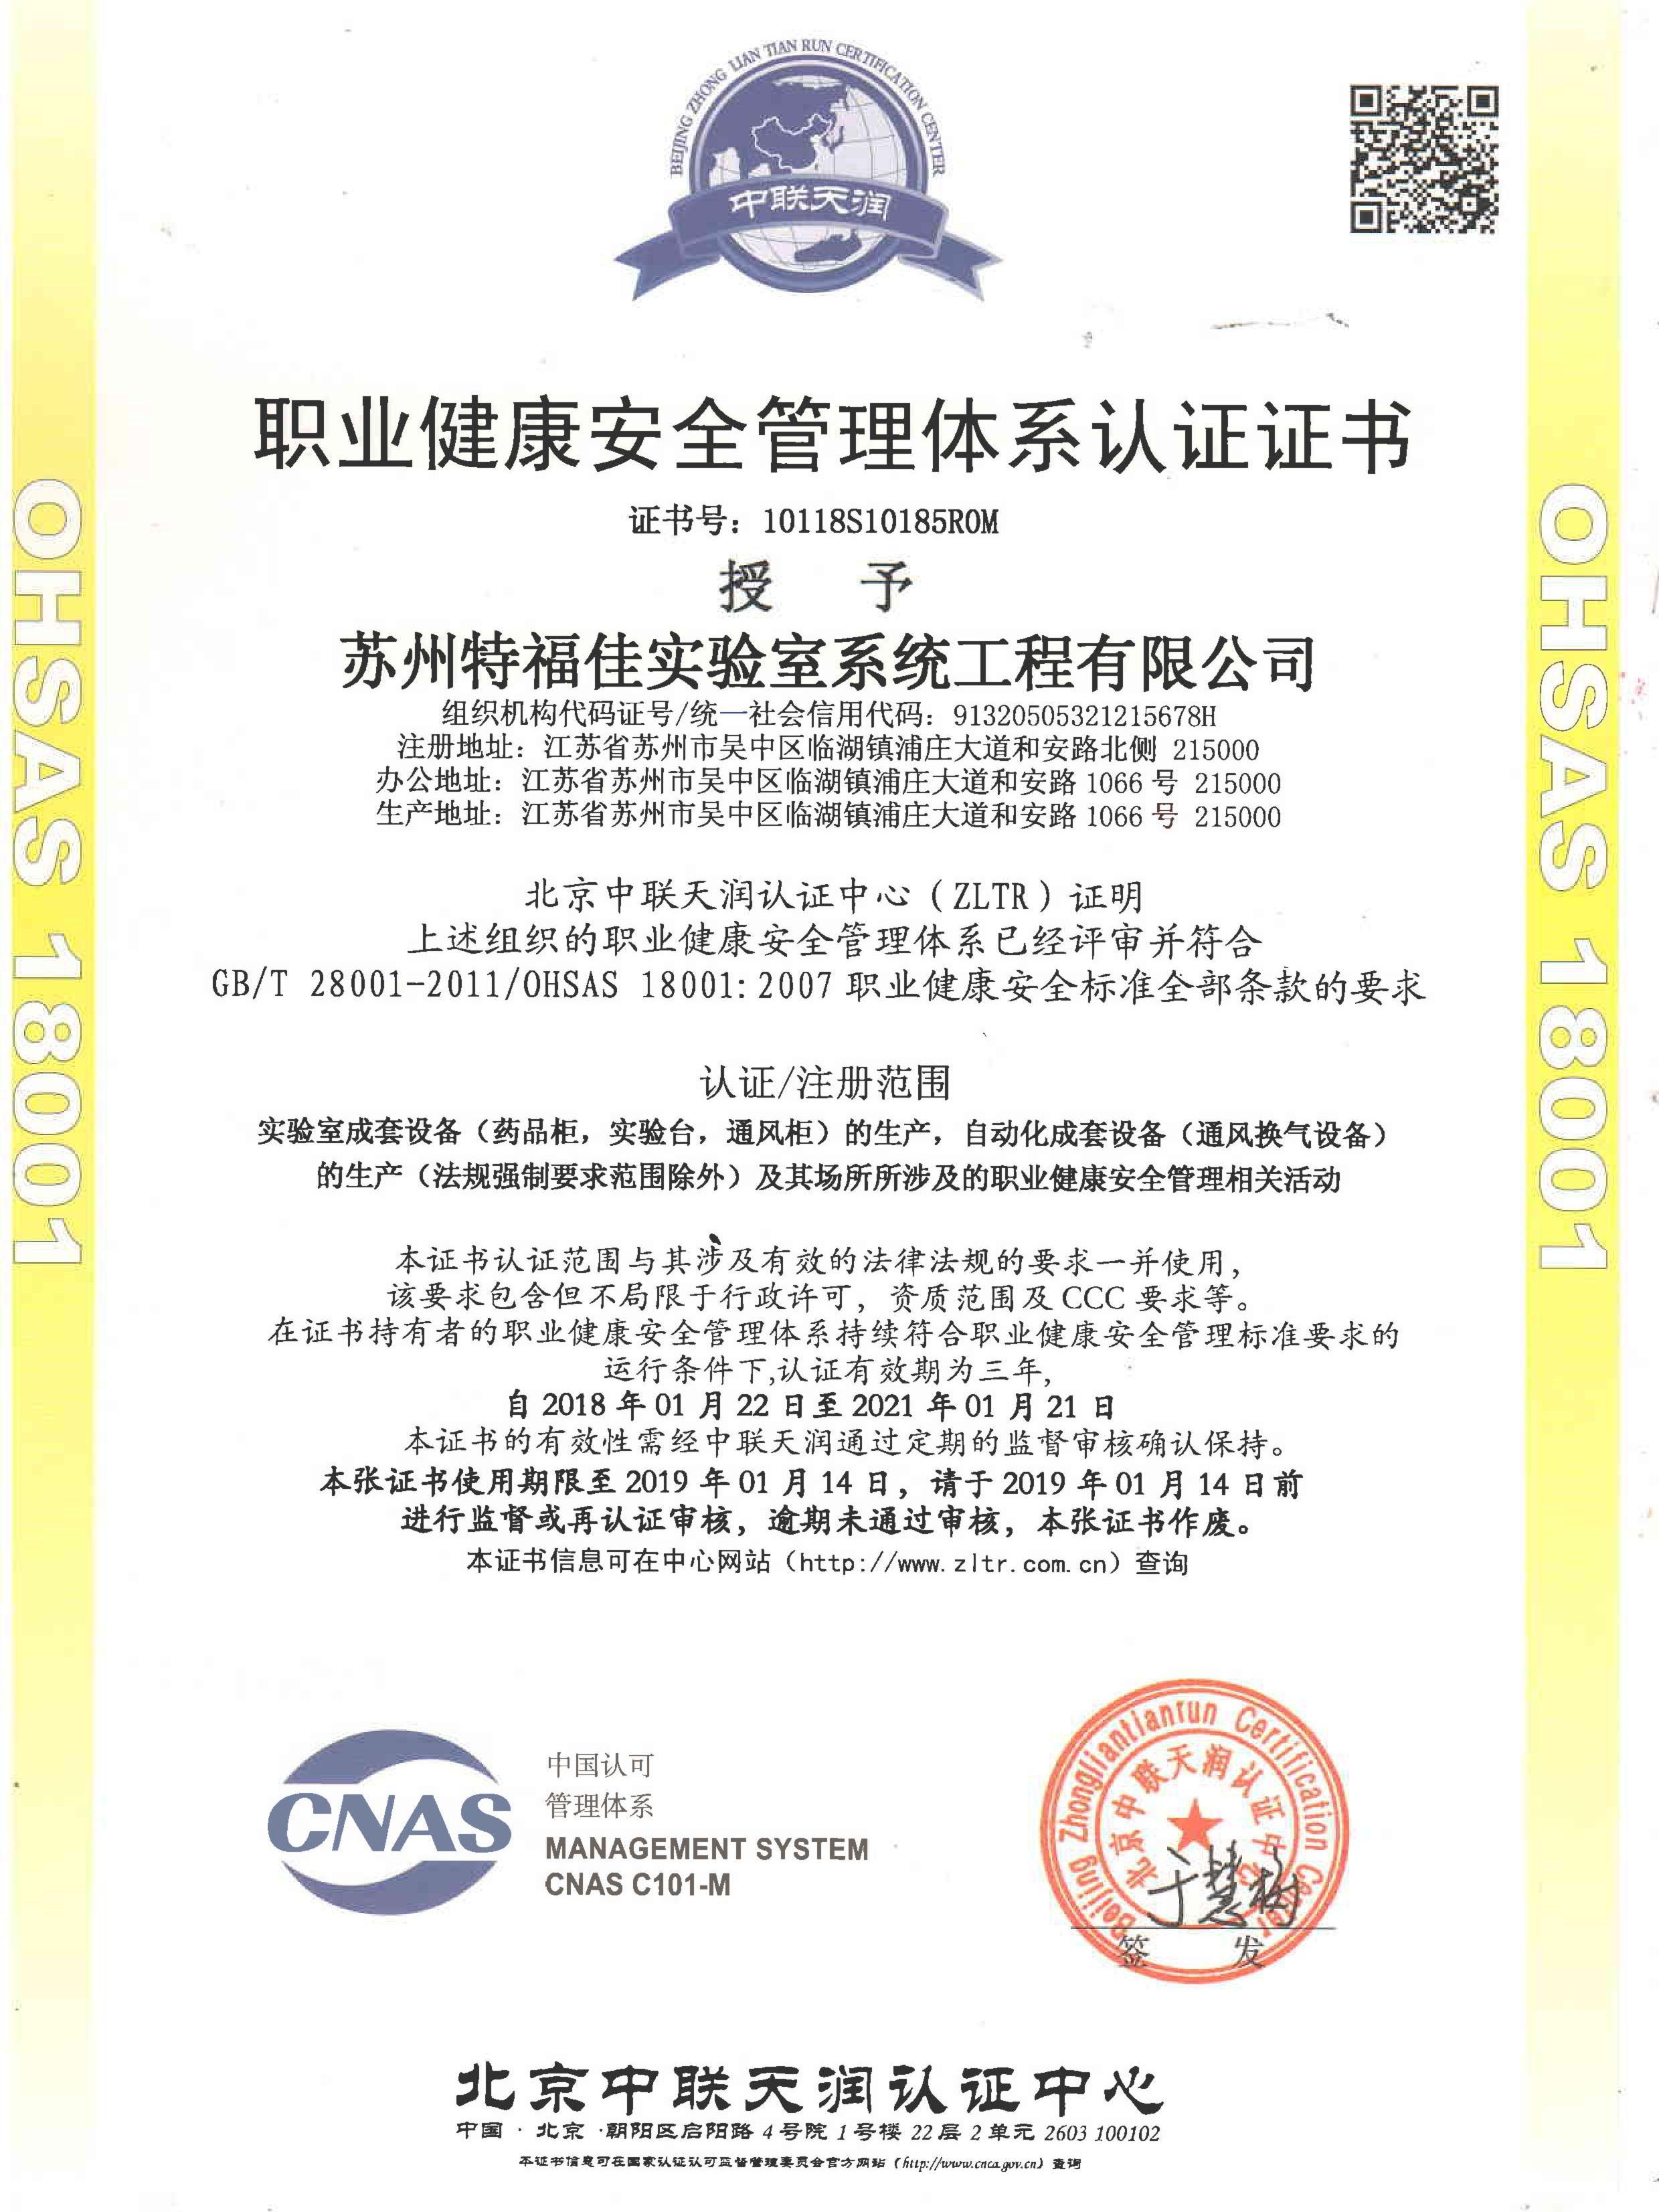 IOS18001职业健康安全管理体系认证